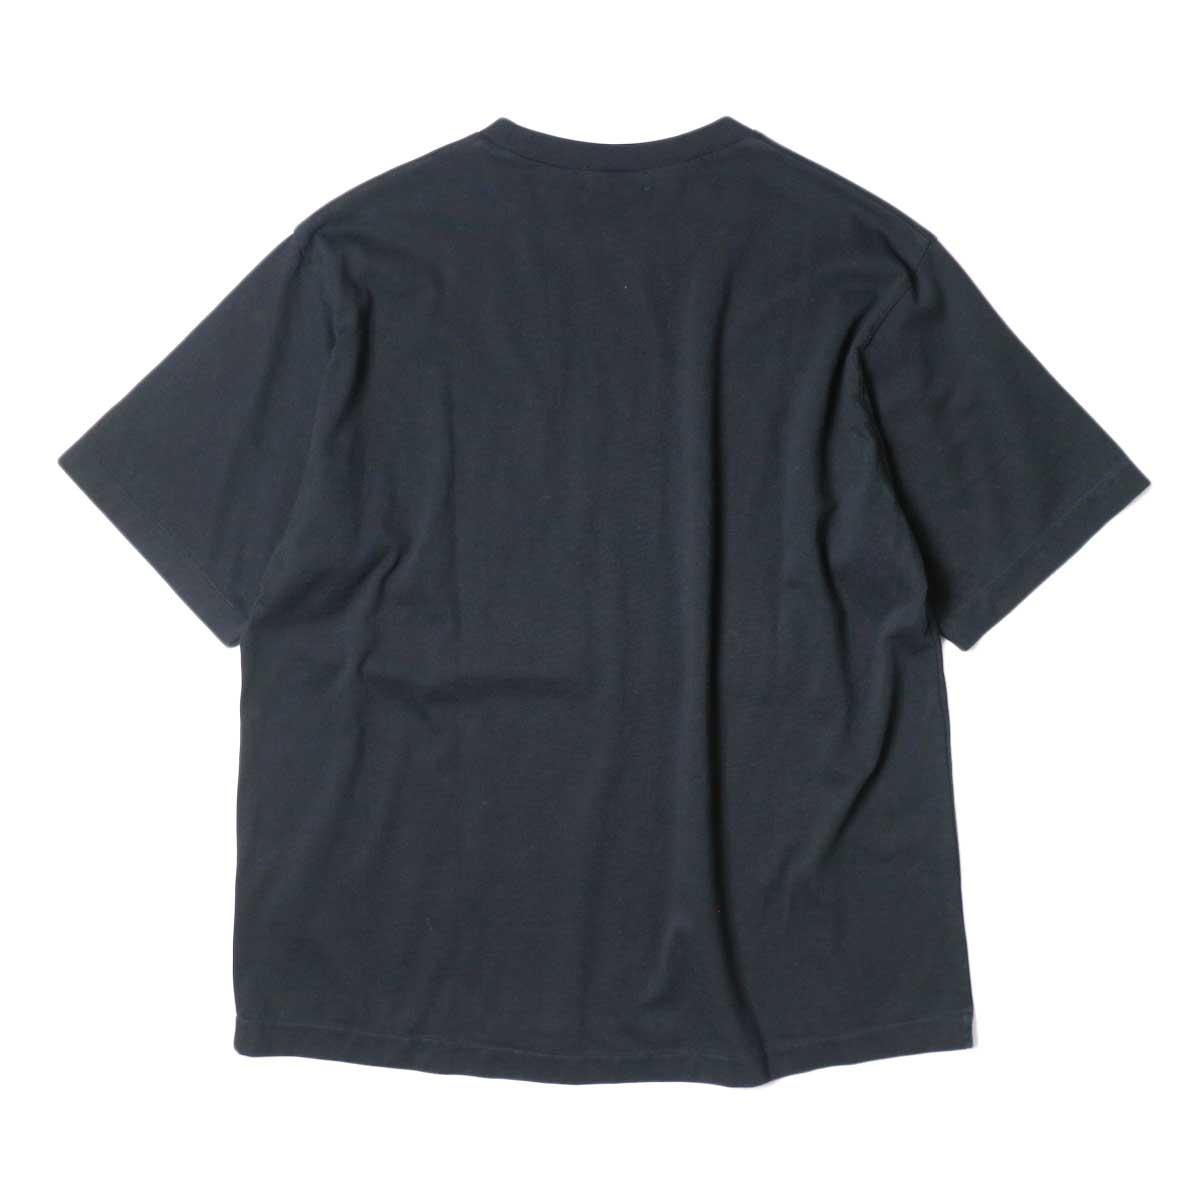 alvana / Dairy Oversize Tee Shirts (Black) 背面